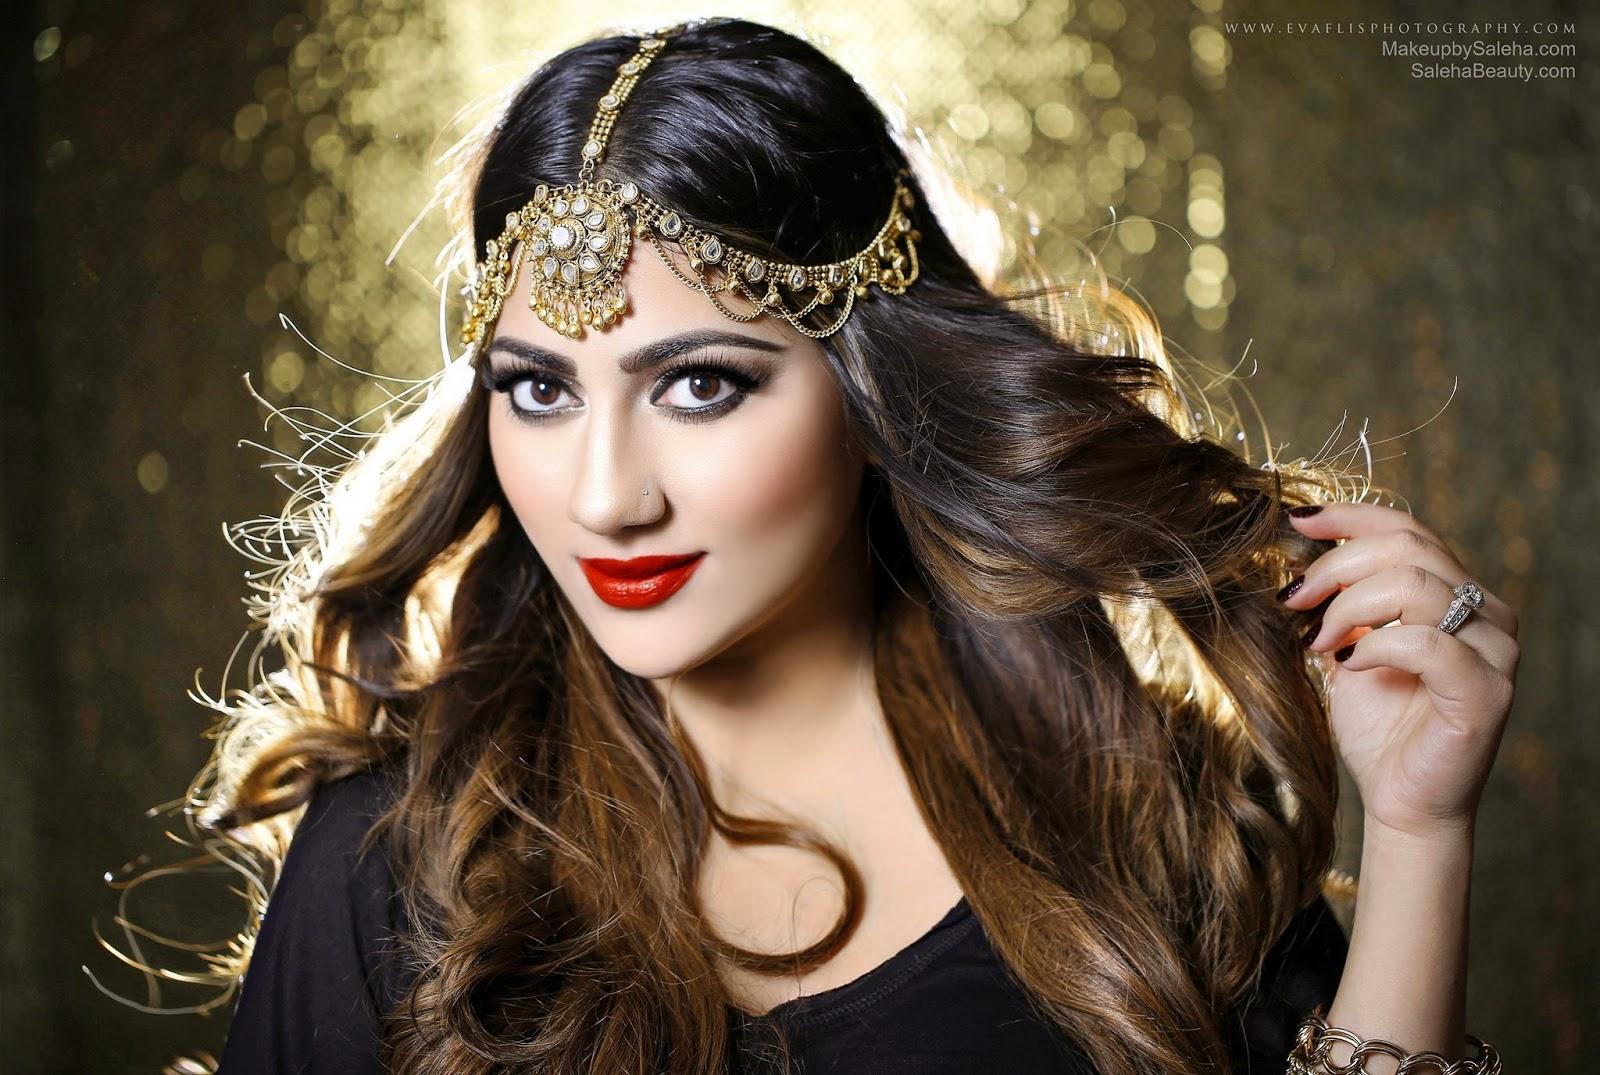 Review: Saleha Lipsticks - Sifa's Corner